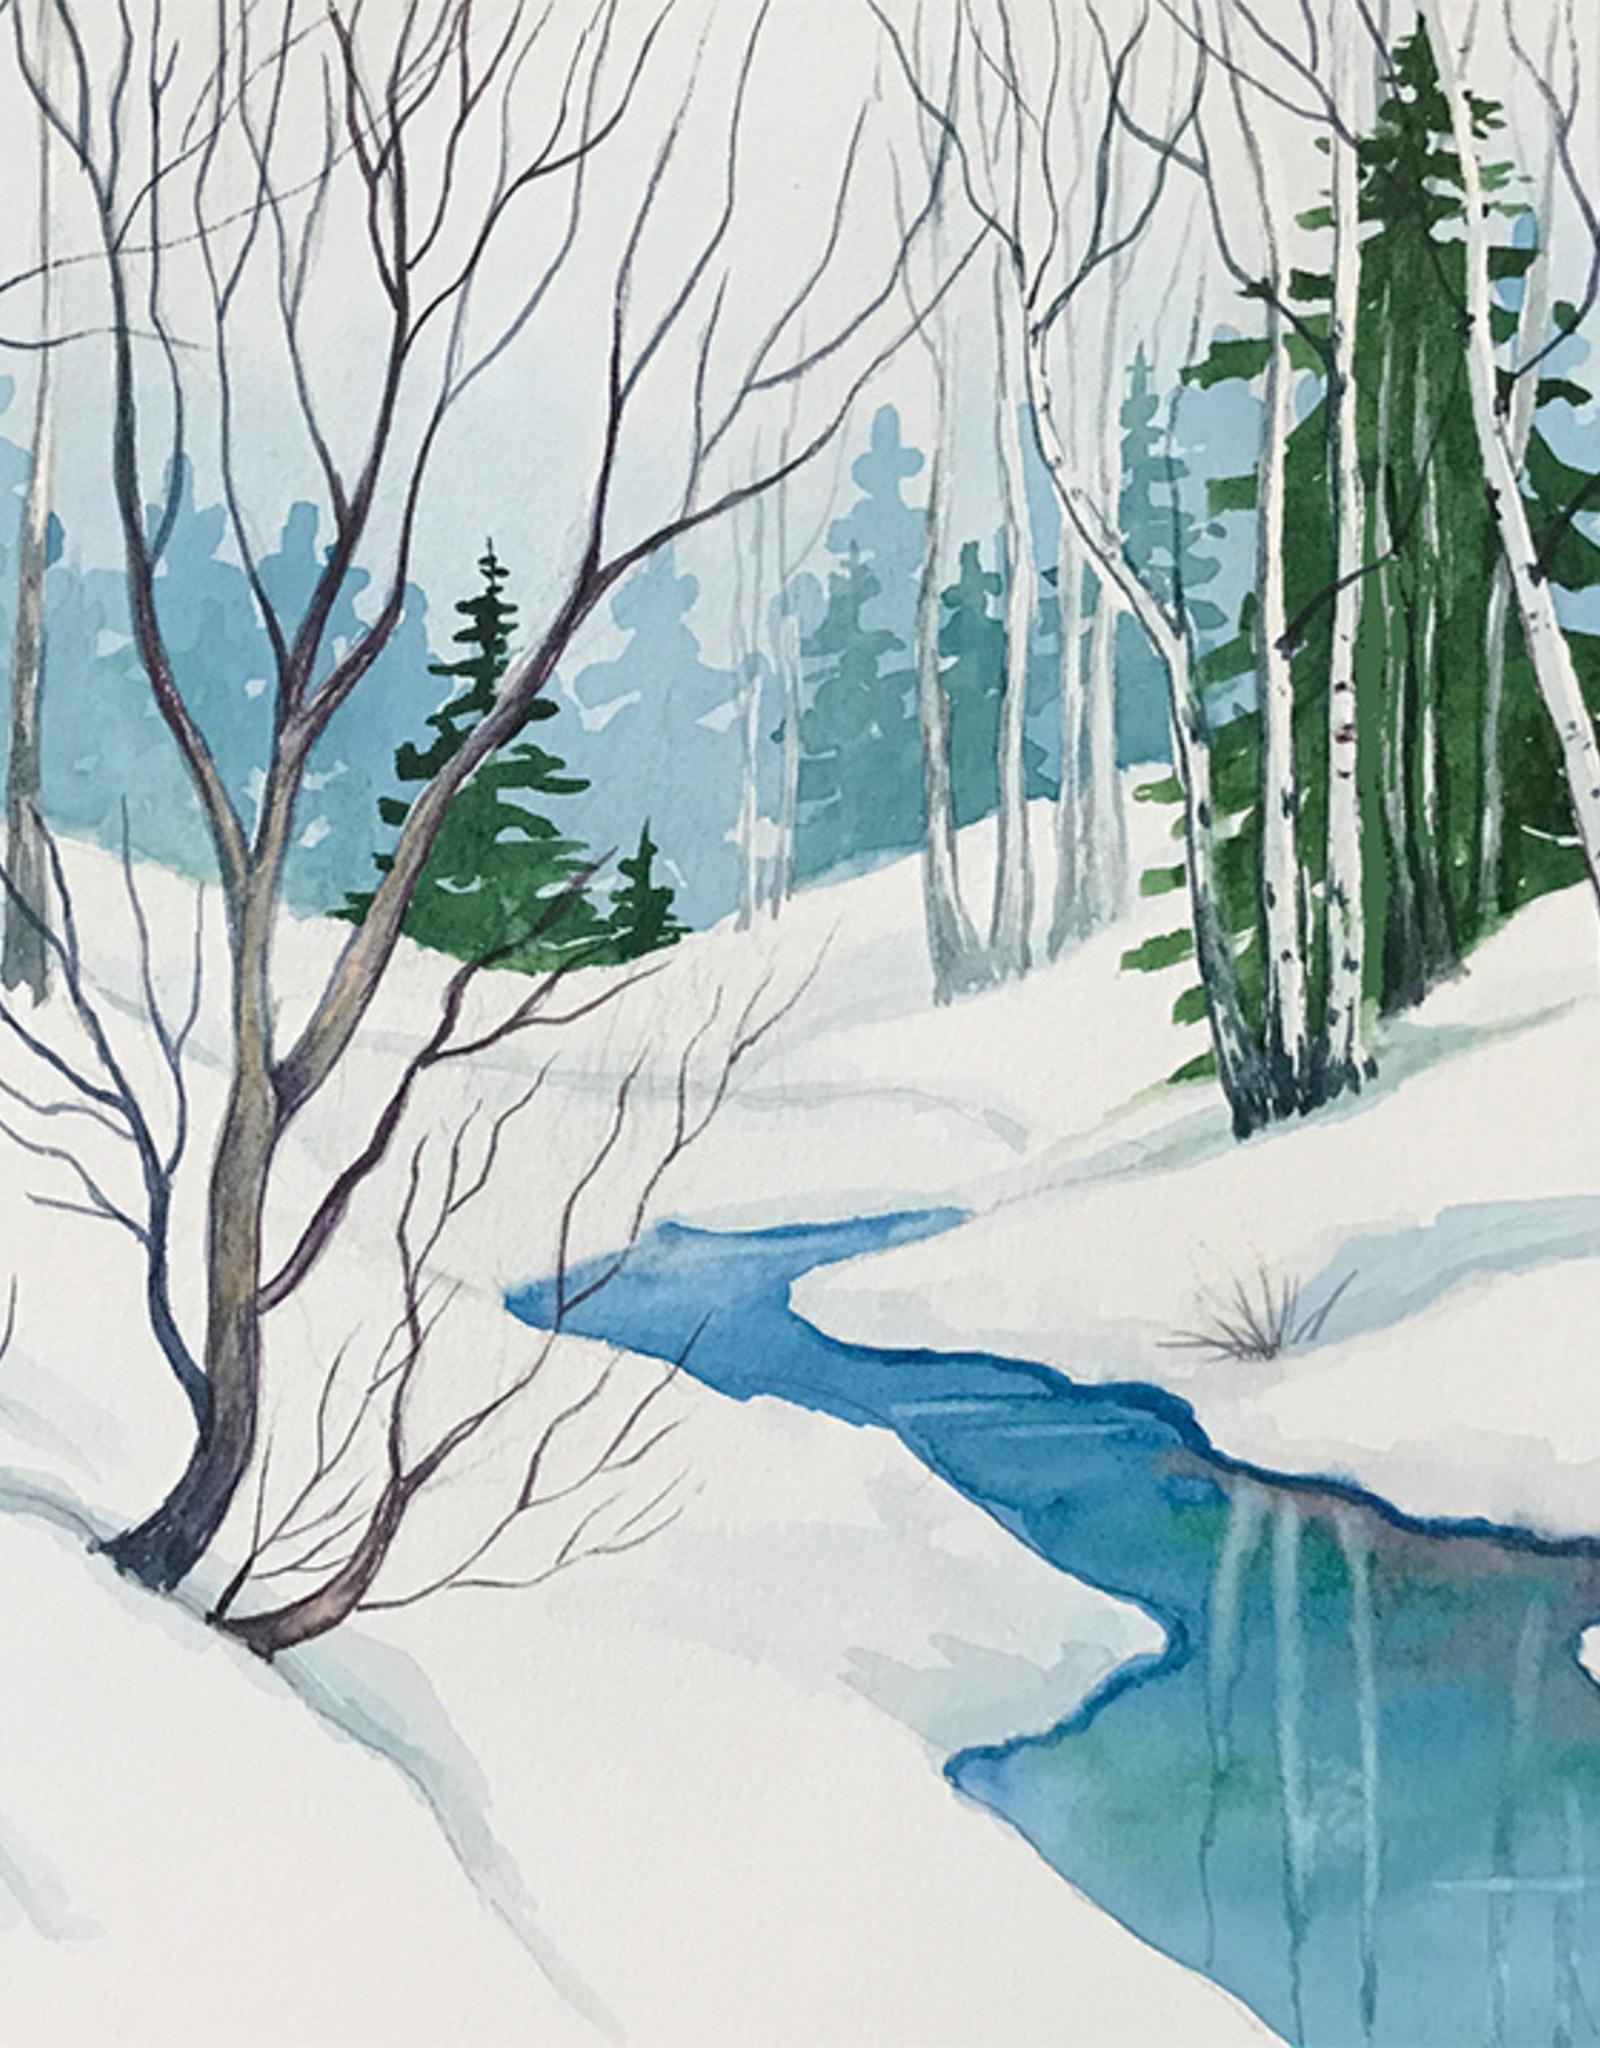 Tamara S Watercolour Art Class Winter Creek Wed Nov 3 1:00  to 3:00 pm